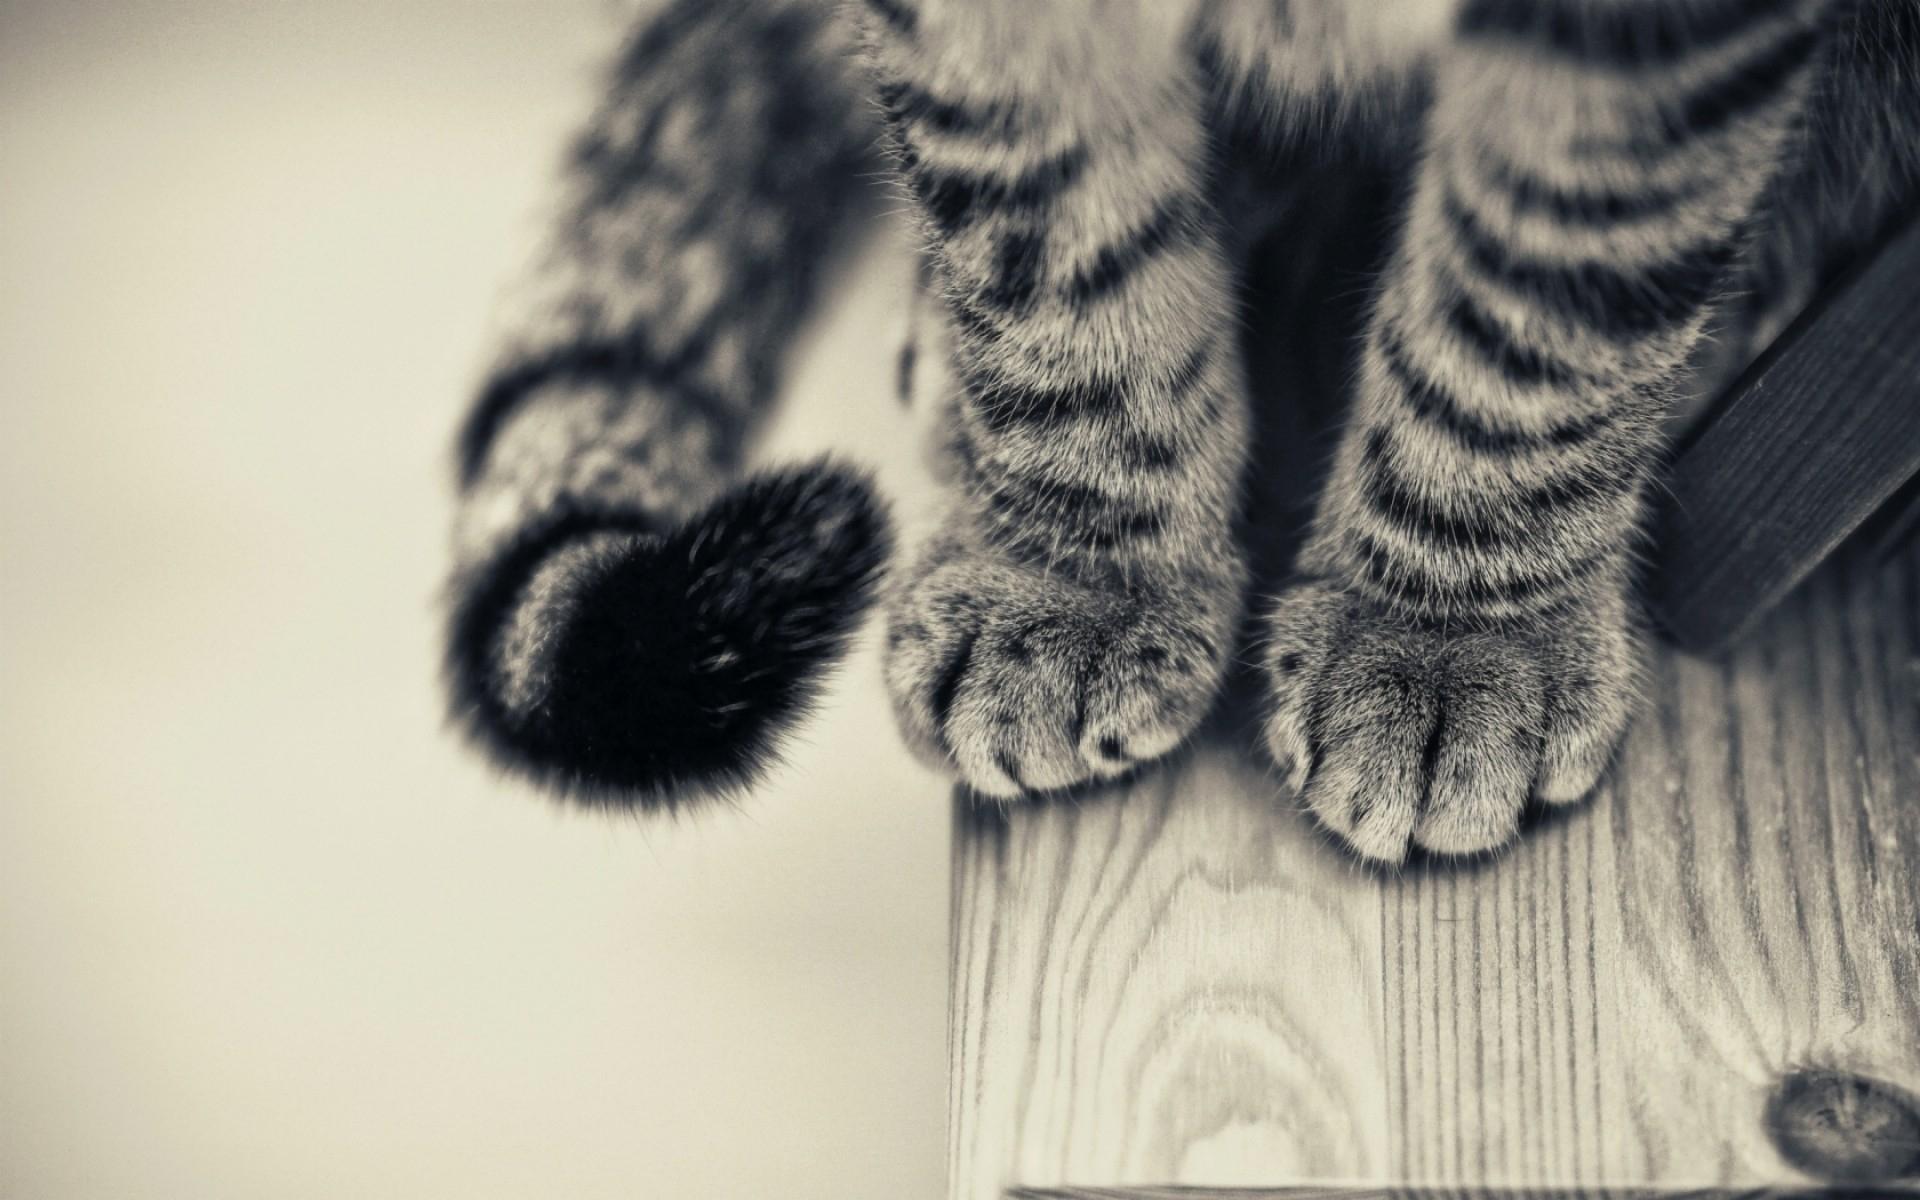 download wallpaper: kattenpootjes wallpaper